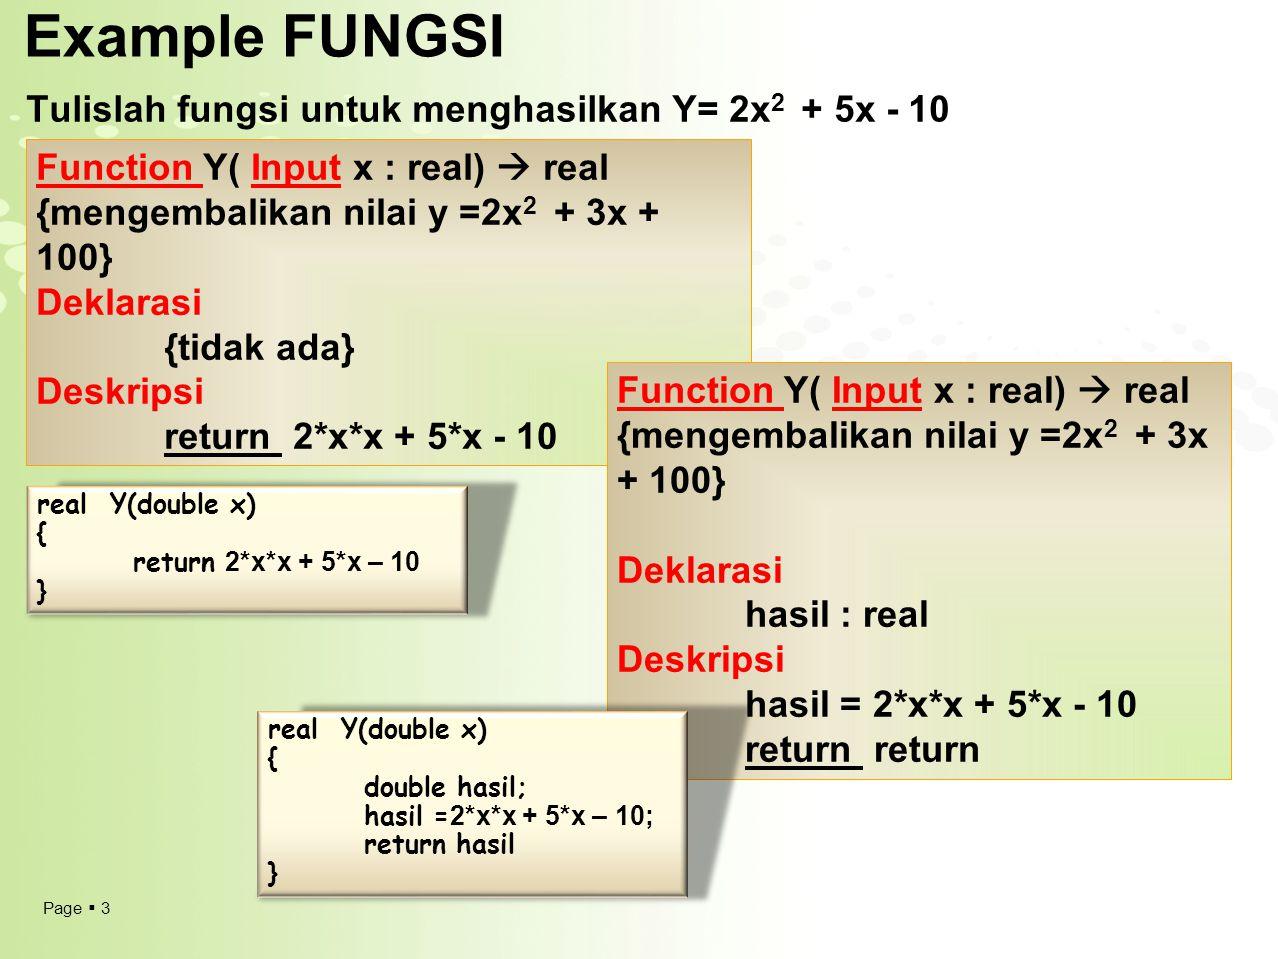 Page  4 Pemanggilan Fungsi  NamaFungsi(daftar_parameter)  Variabel  NamaFungsi(daftar_parameter) Atau nilai yang dikembalikan oleh fungsi dapat langsung dimanipulasi (digunakan) contoh :  Write(NamaFungsi(daftar_parameter))  If NamaFungsi(daftar_parameter) <0 then  z  2 * NamaFungsi(daftar_parameter) Algoritma PanggilFungsi {Program Utama untuk memanggil fungsi} Deklarasi Function Y( Input x : real)  real a,b: real Deskripsi write(Y( 10)) read(a) write(Y( a)) b  y(20) write(b) PROGRAM UTAMA Function Y( Input x : real)  real {mengembalikan nilai y =2x 2 + 3x + 100} Deklarasi {tidak ada} Deskripsi return 2*x*x + 5*x - 10